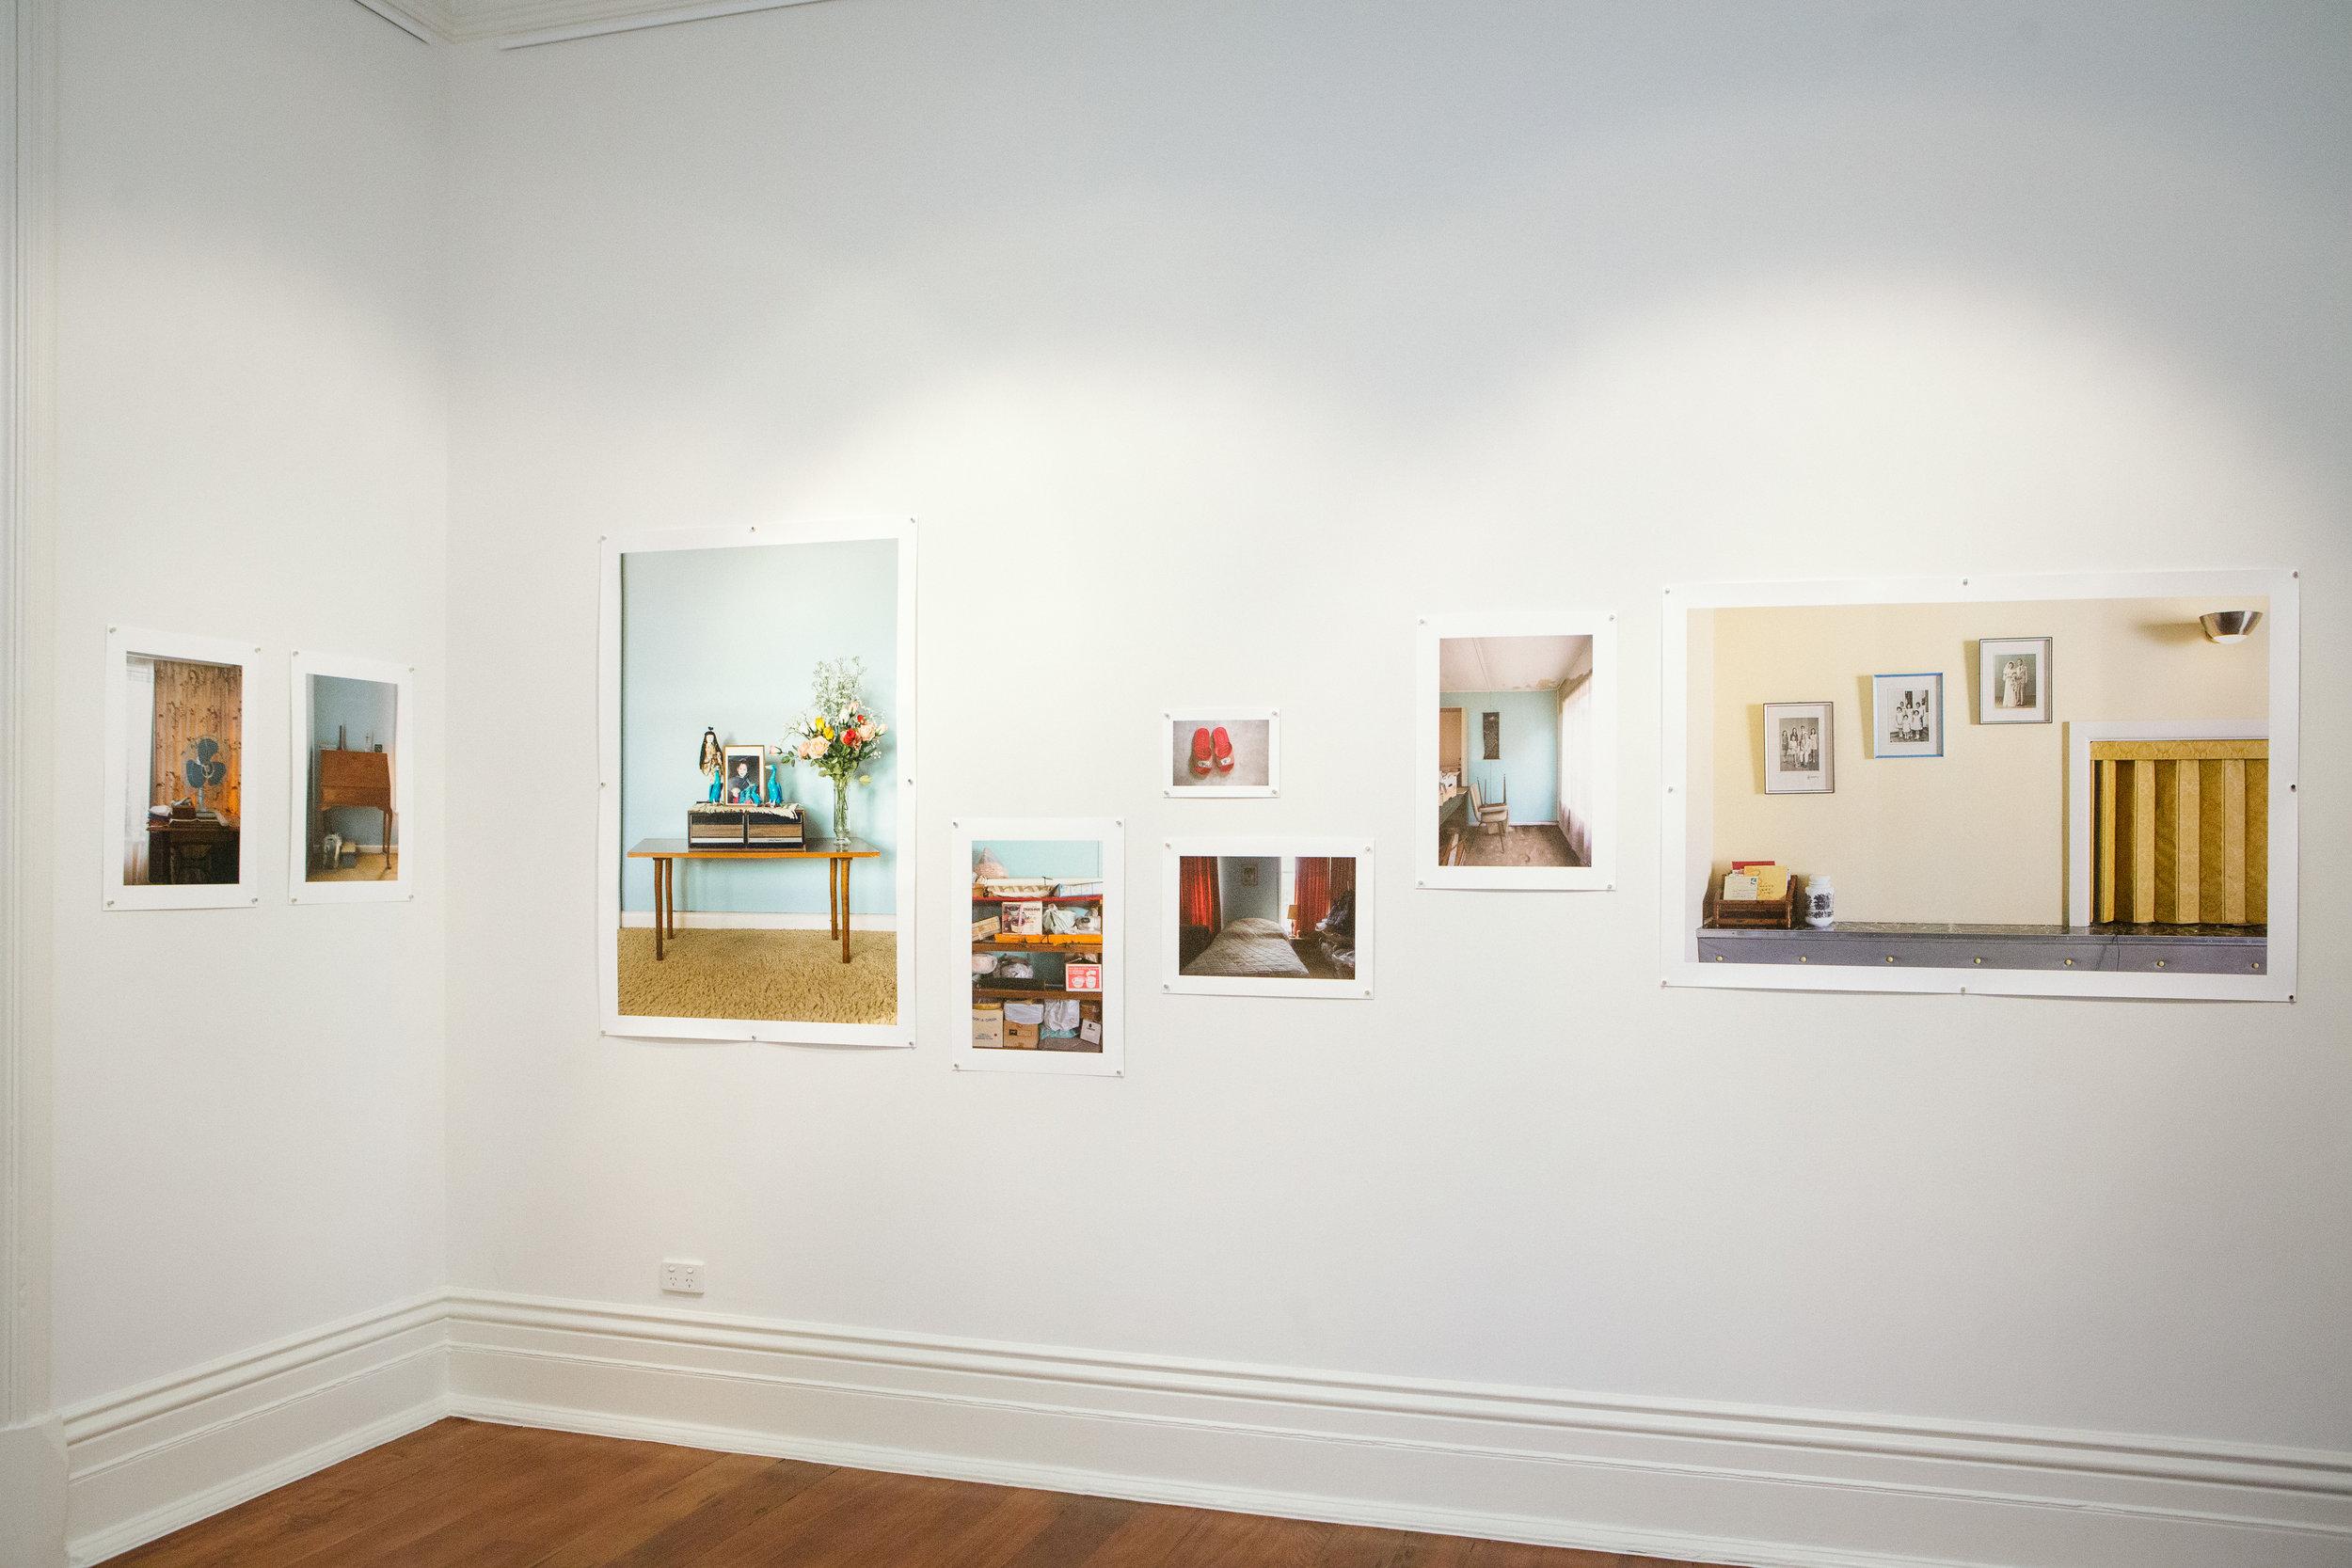 Bundoora Homestead exhibition view - photo Nicola Dracoulis